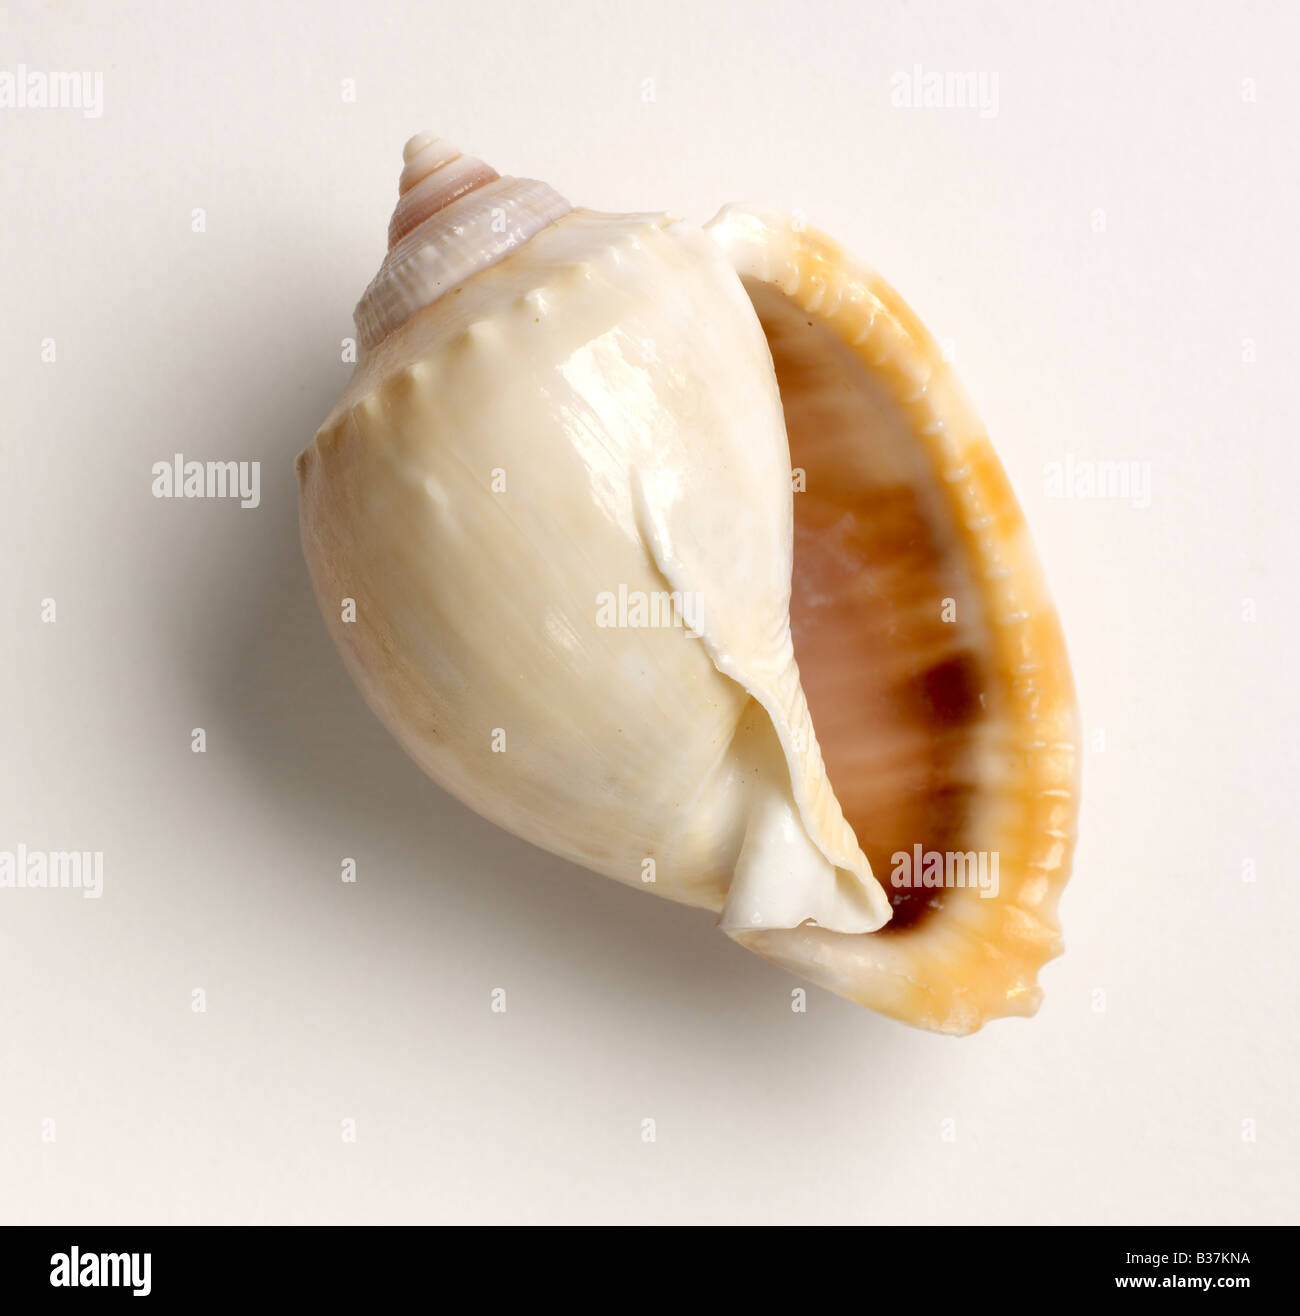 Seashell Imagen De Stock